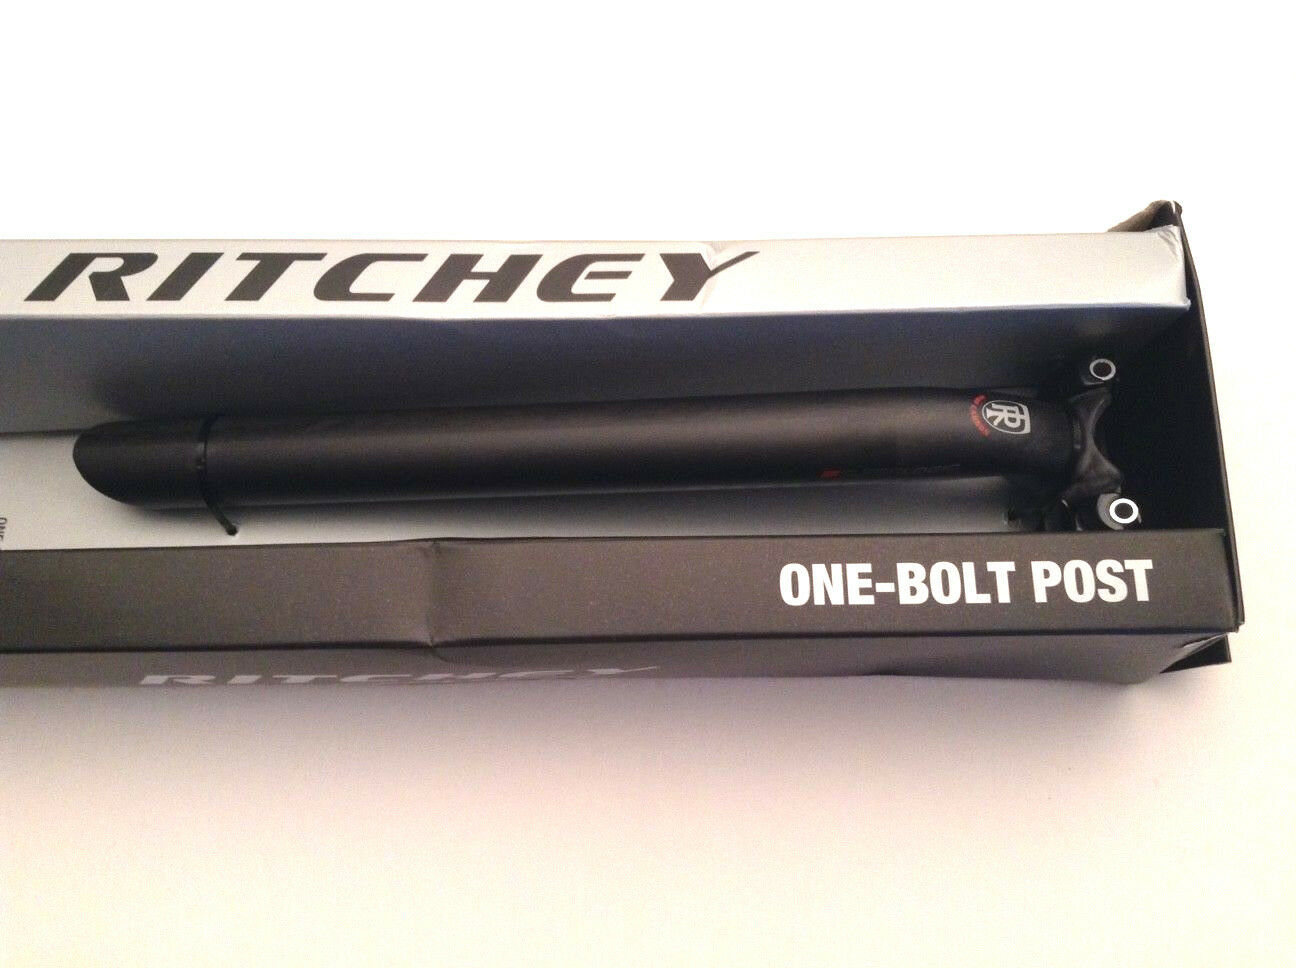 Ritchey Superlogic One-Bolt Post Carbon Seatpost 31.6 x 400mm New